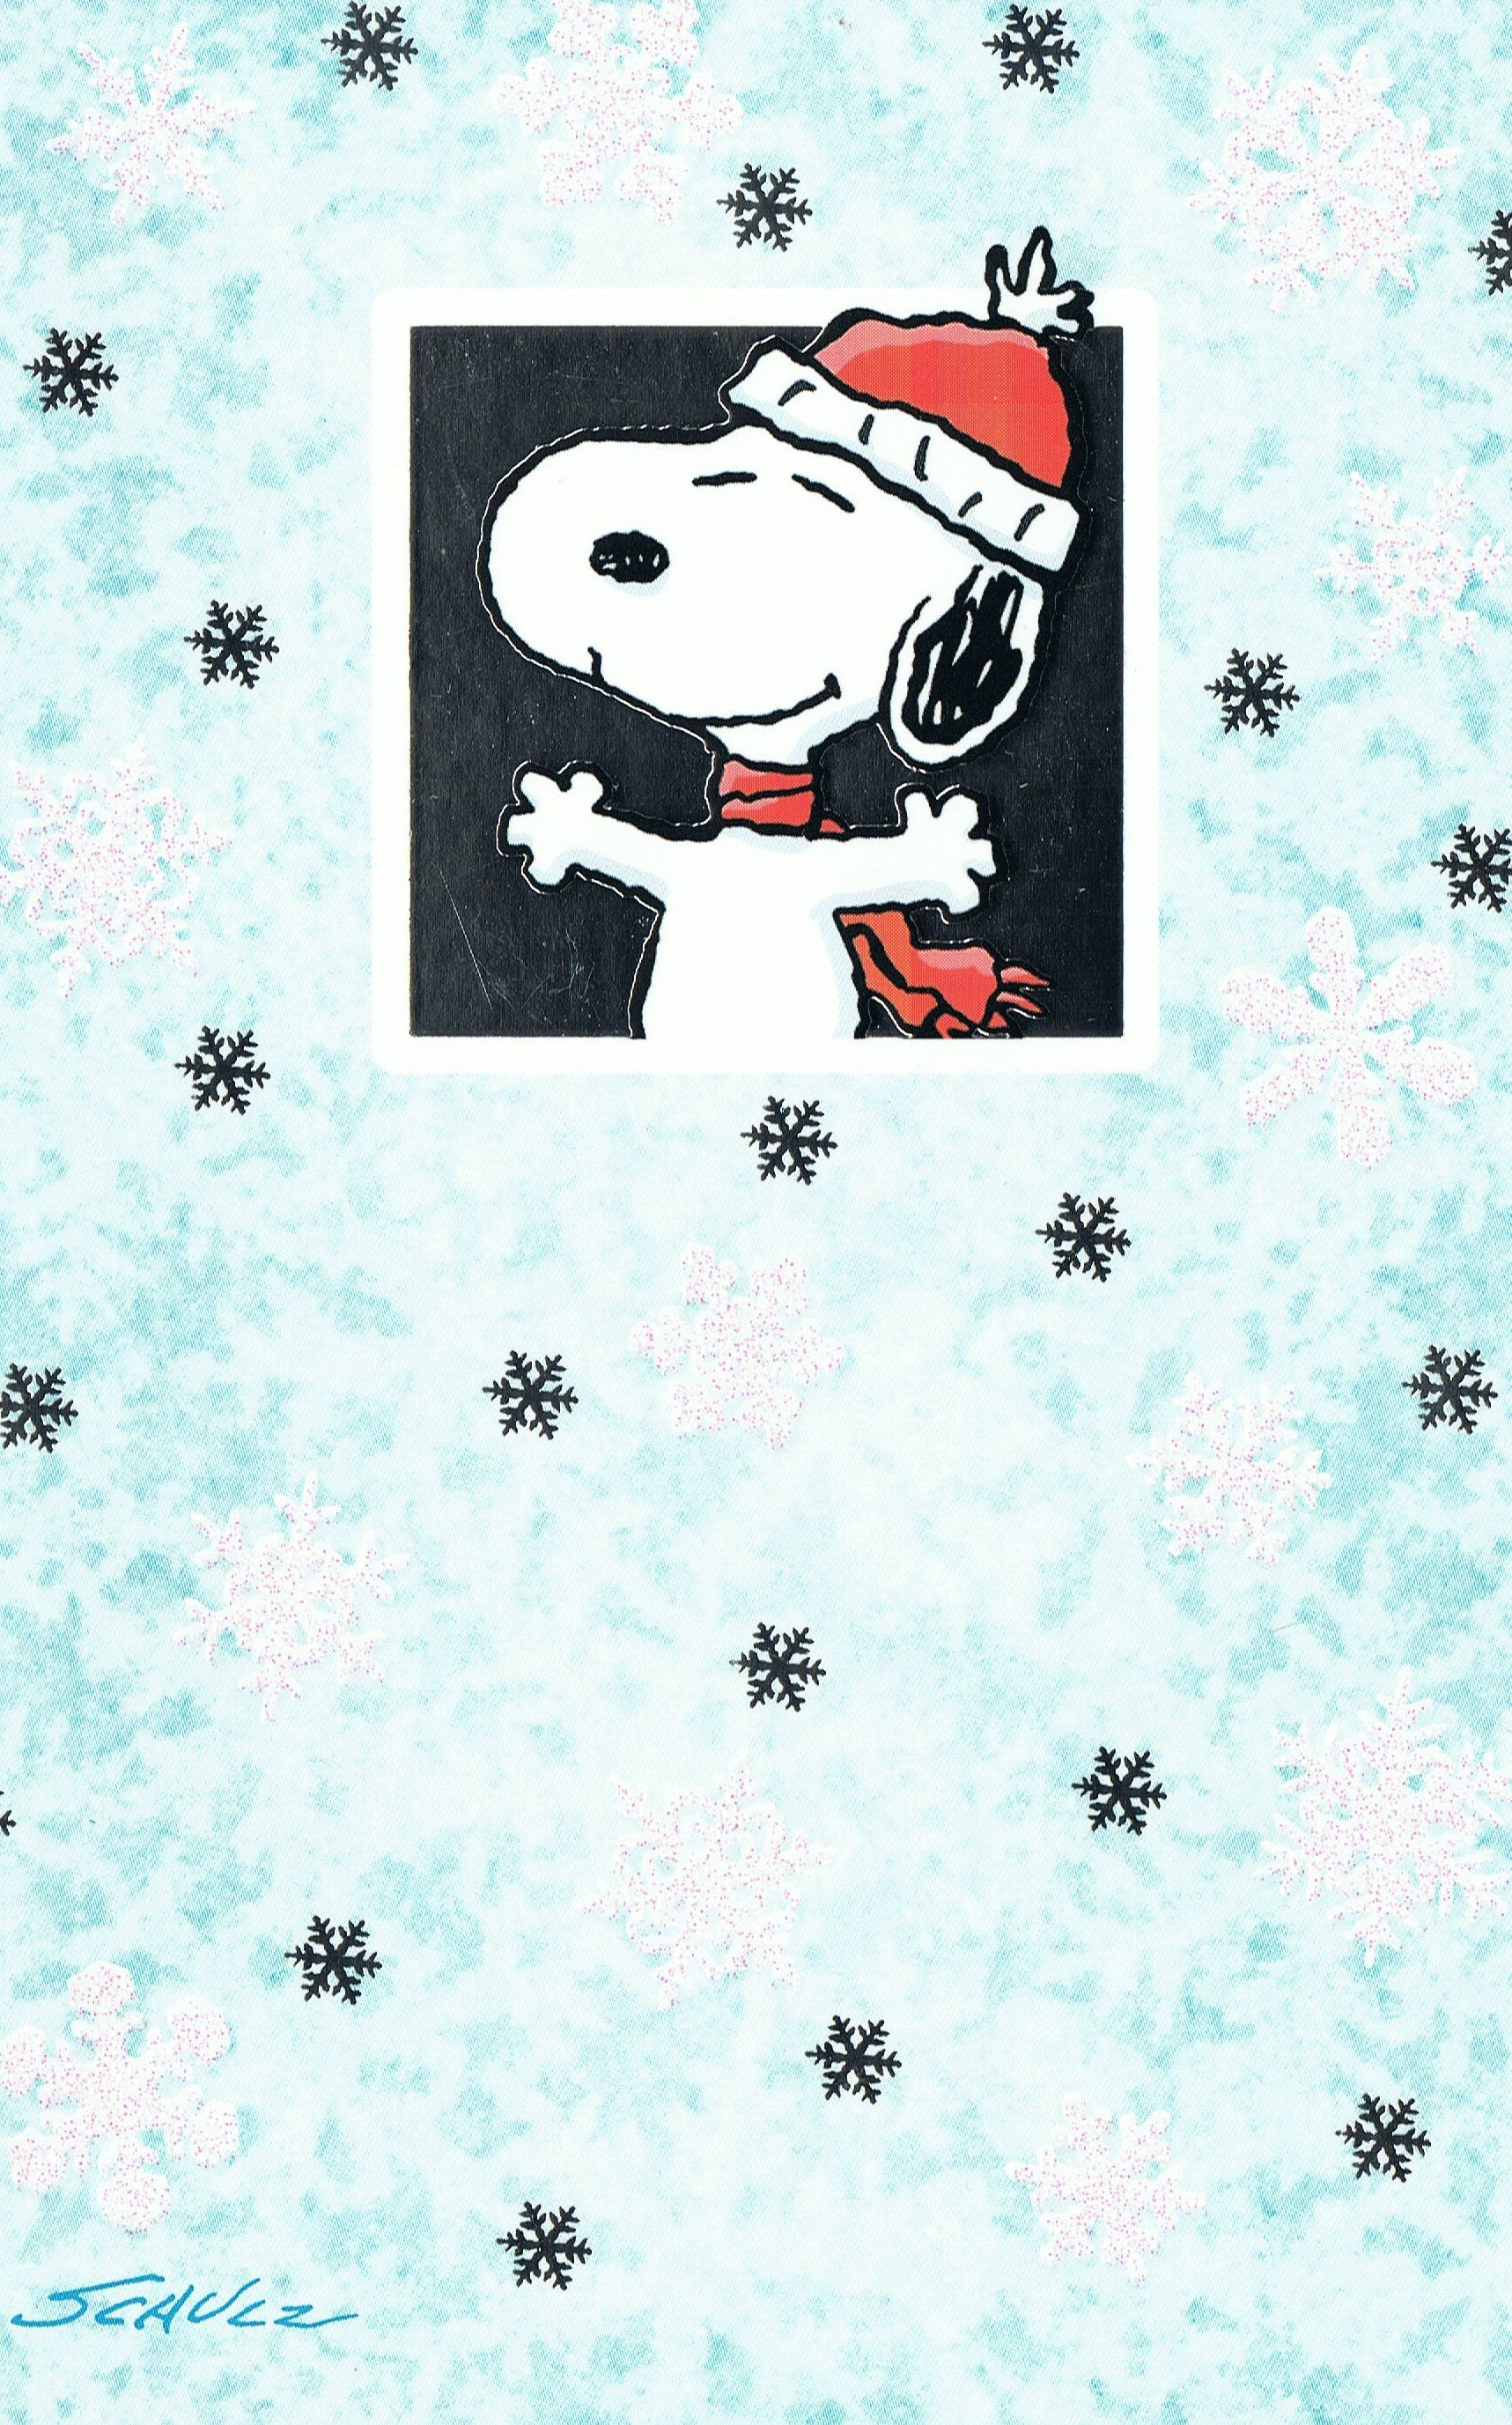 SNOWFLAKES, SNOWFLAKES...NEVER TWO ALIKE!